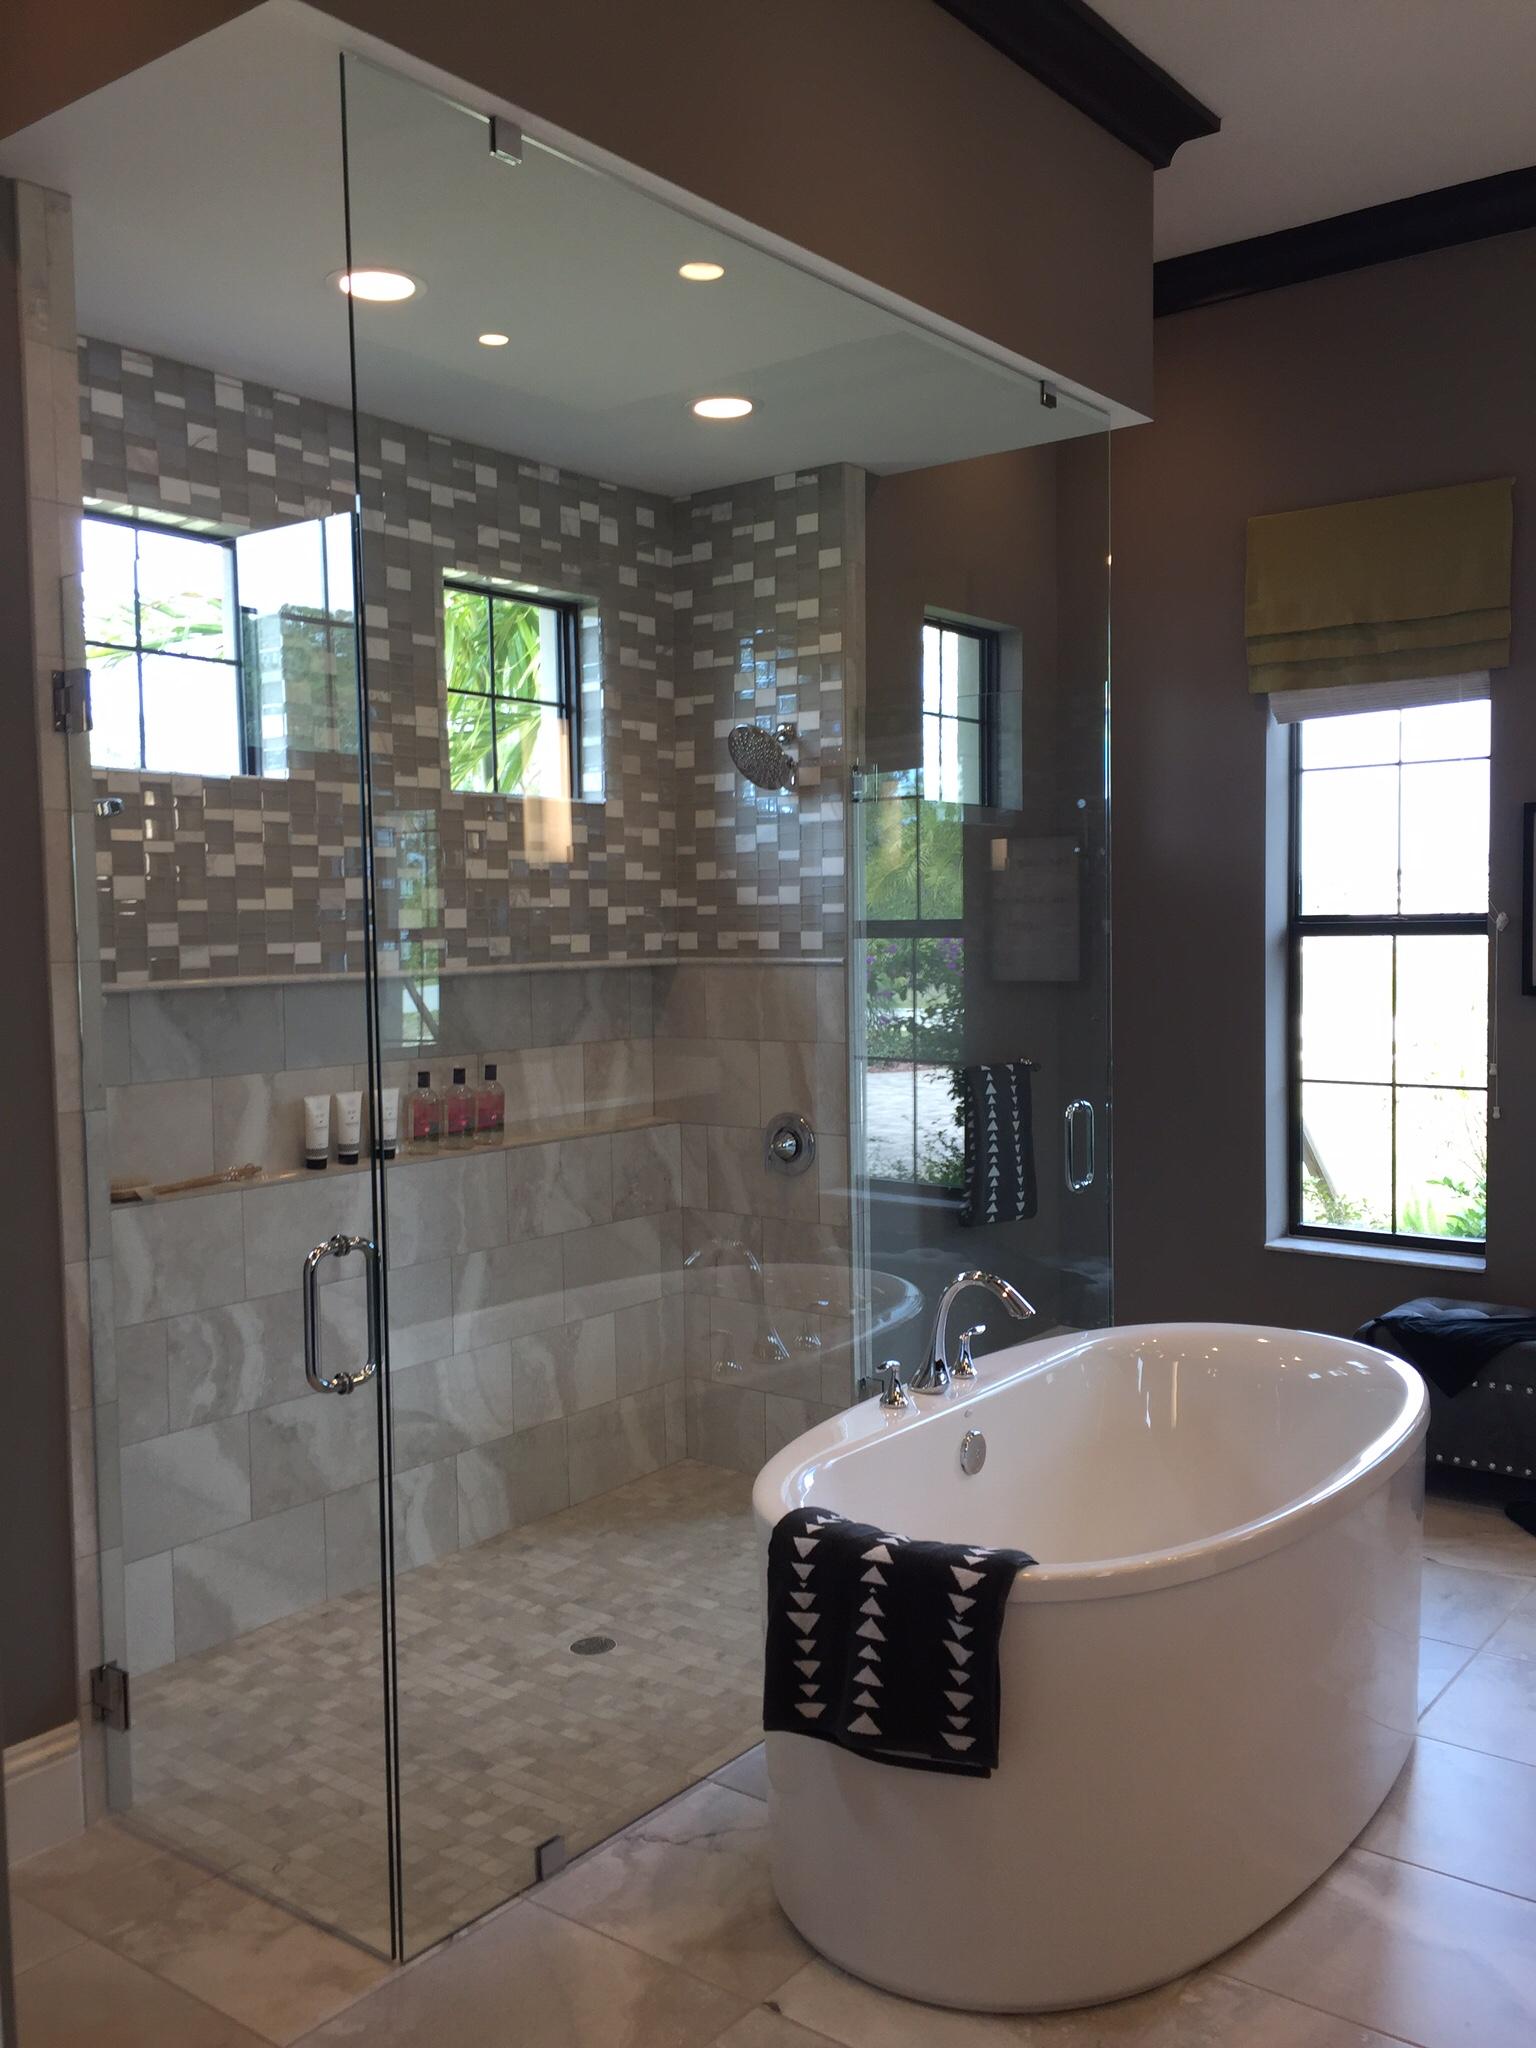 Things To Consider: Installing Custom Shower Doors